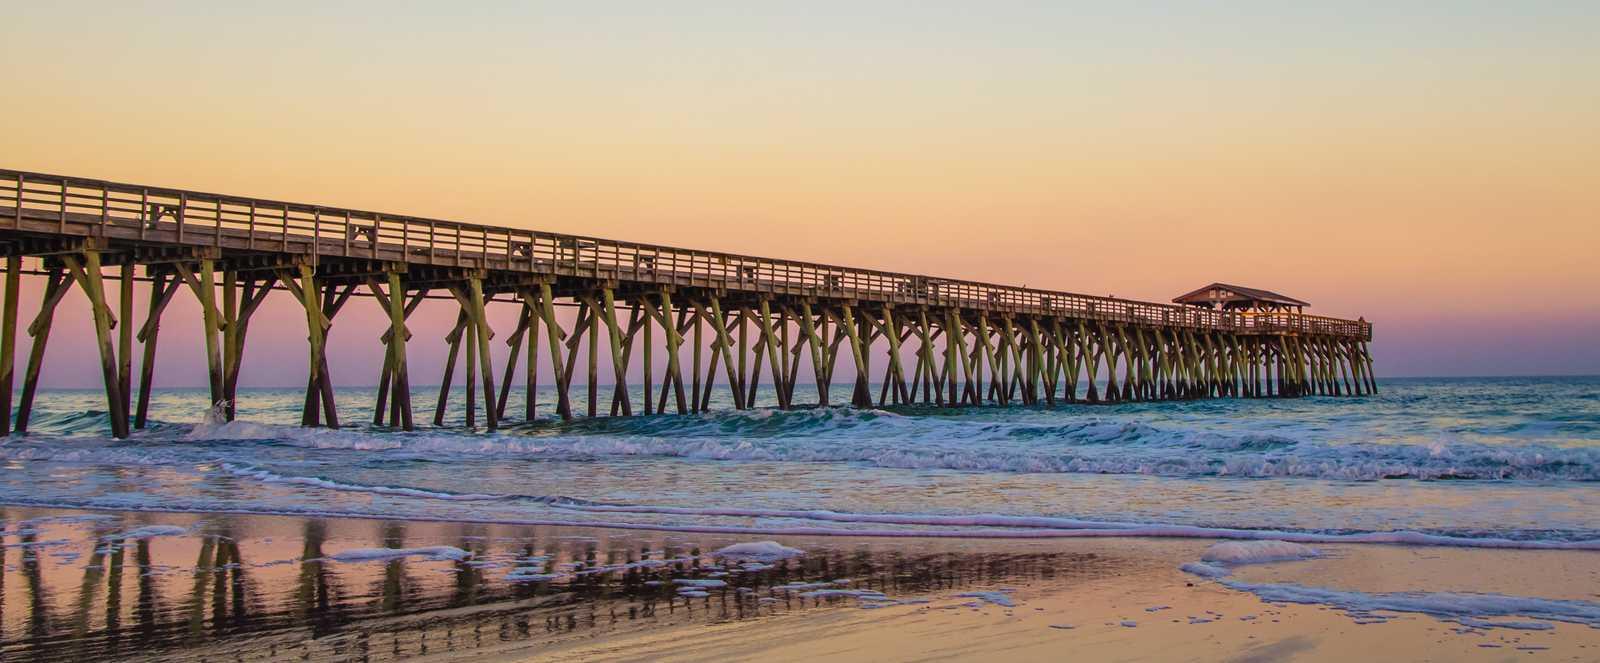 Sonnenuntergang am Myrtle Beach Ocean Pier in South Carolina